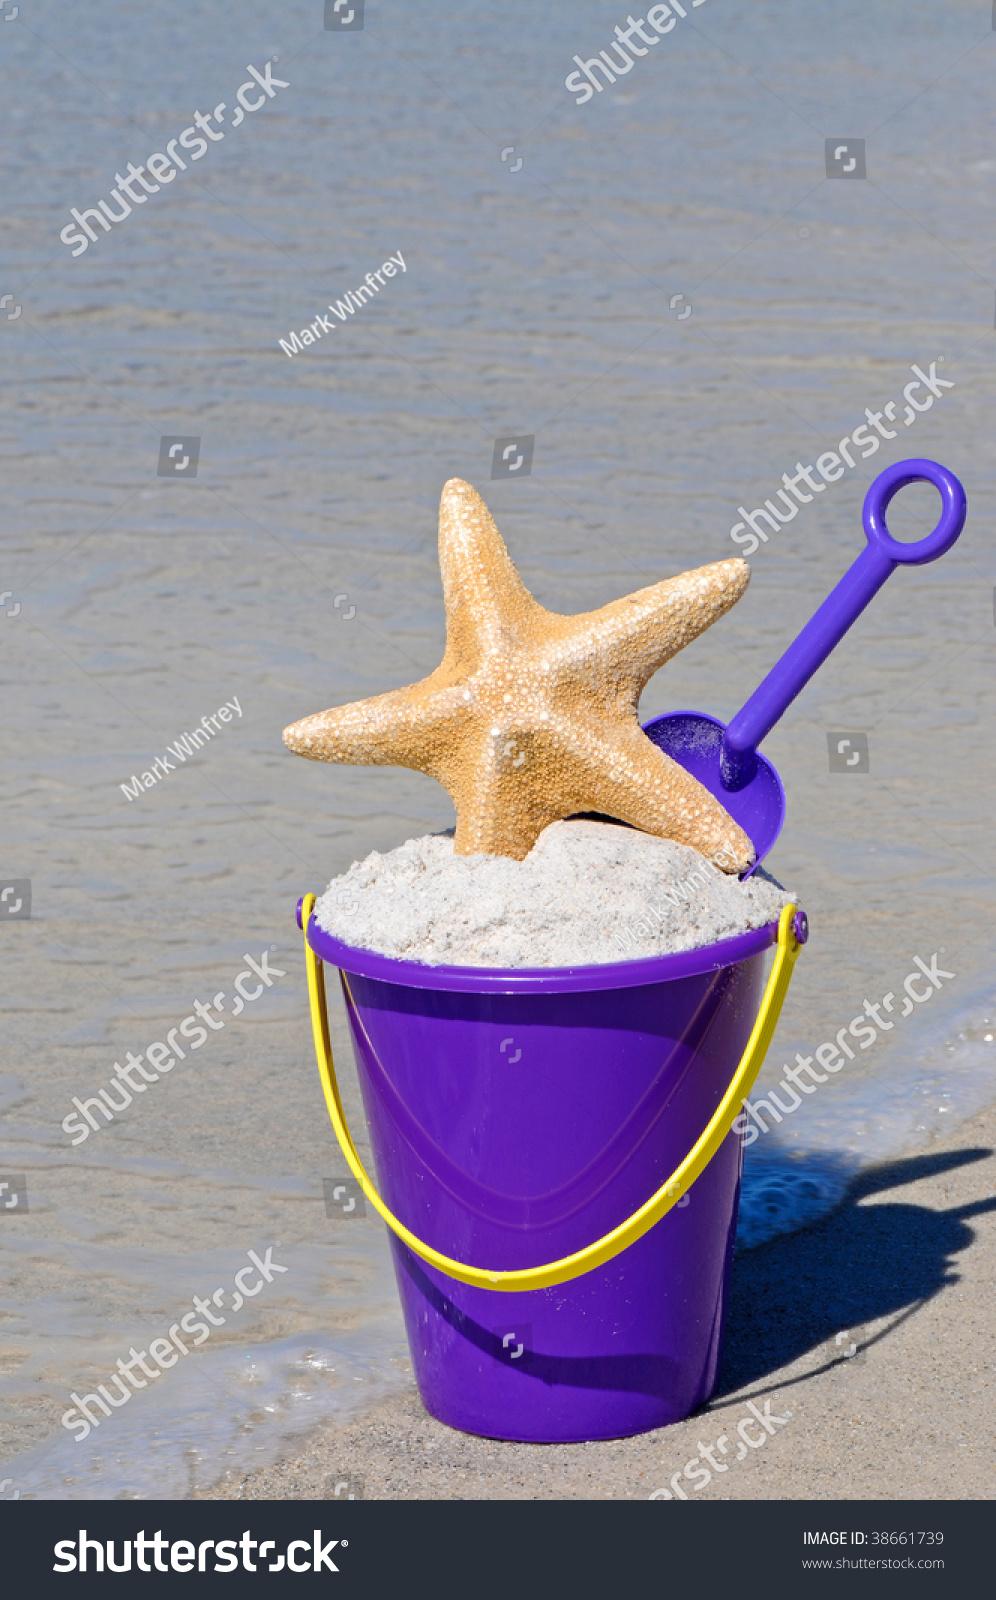 stock-photo-beach-bucket-full-of-sand-wi